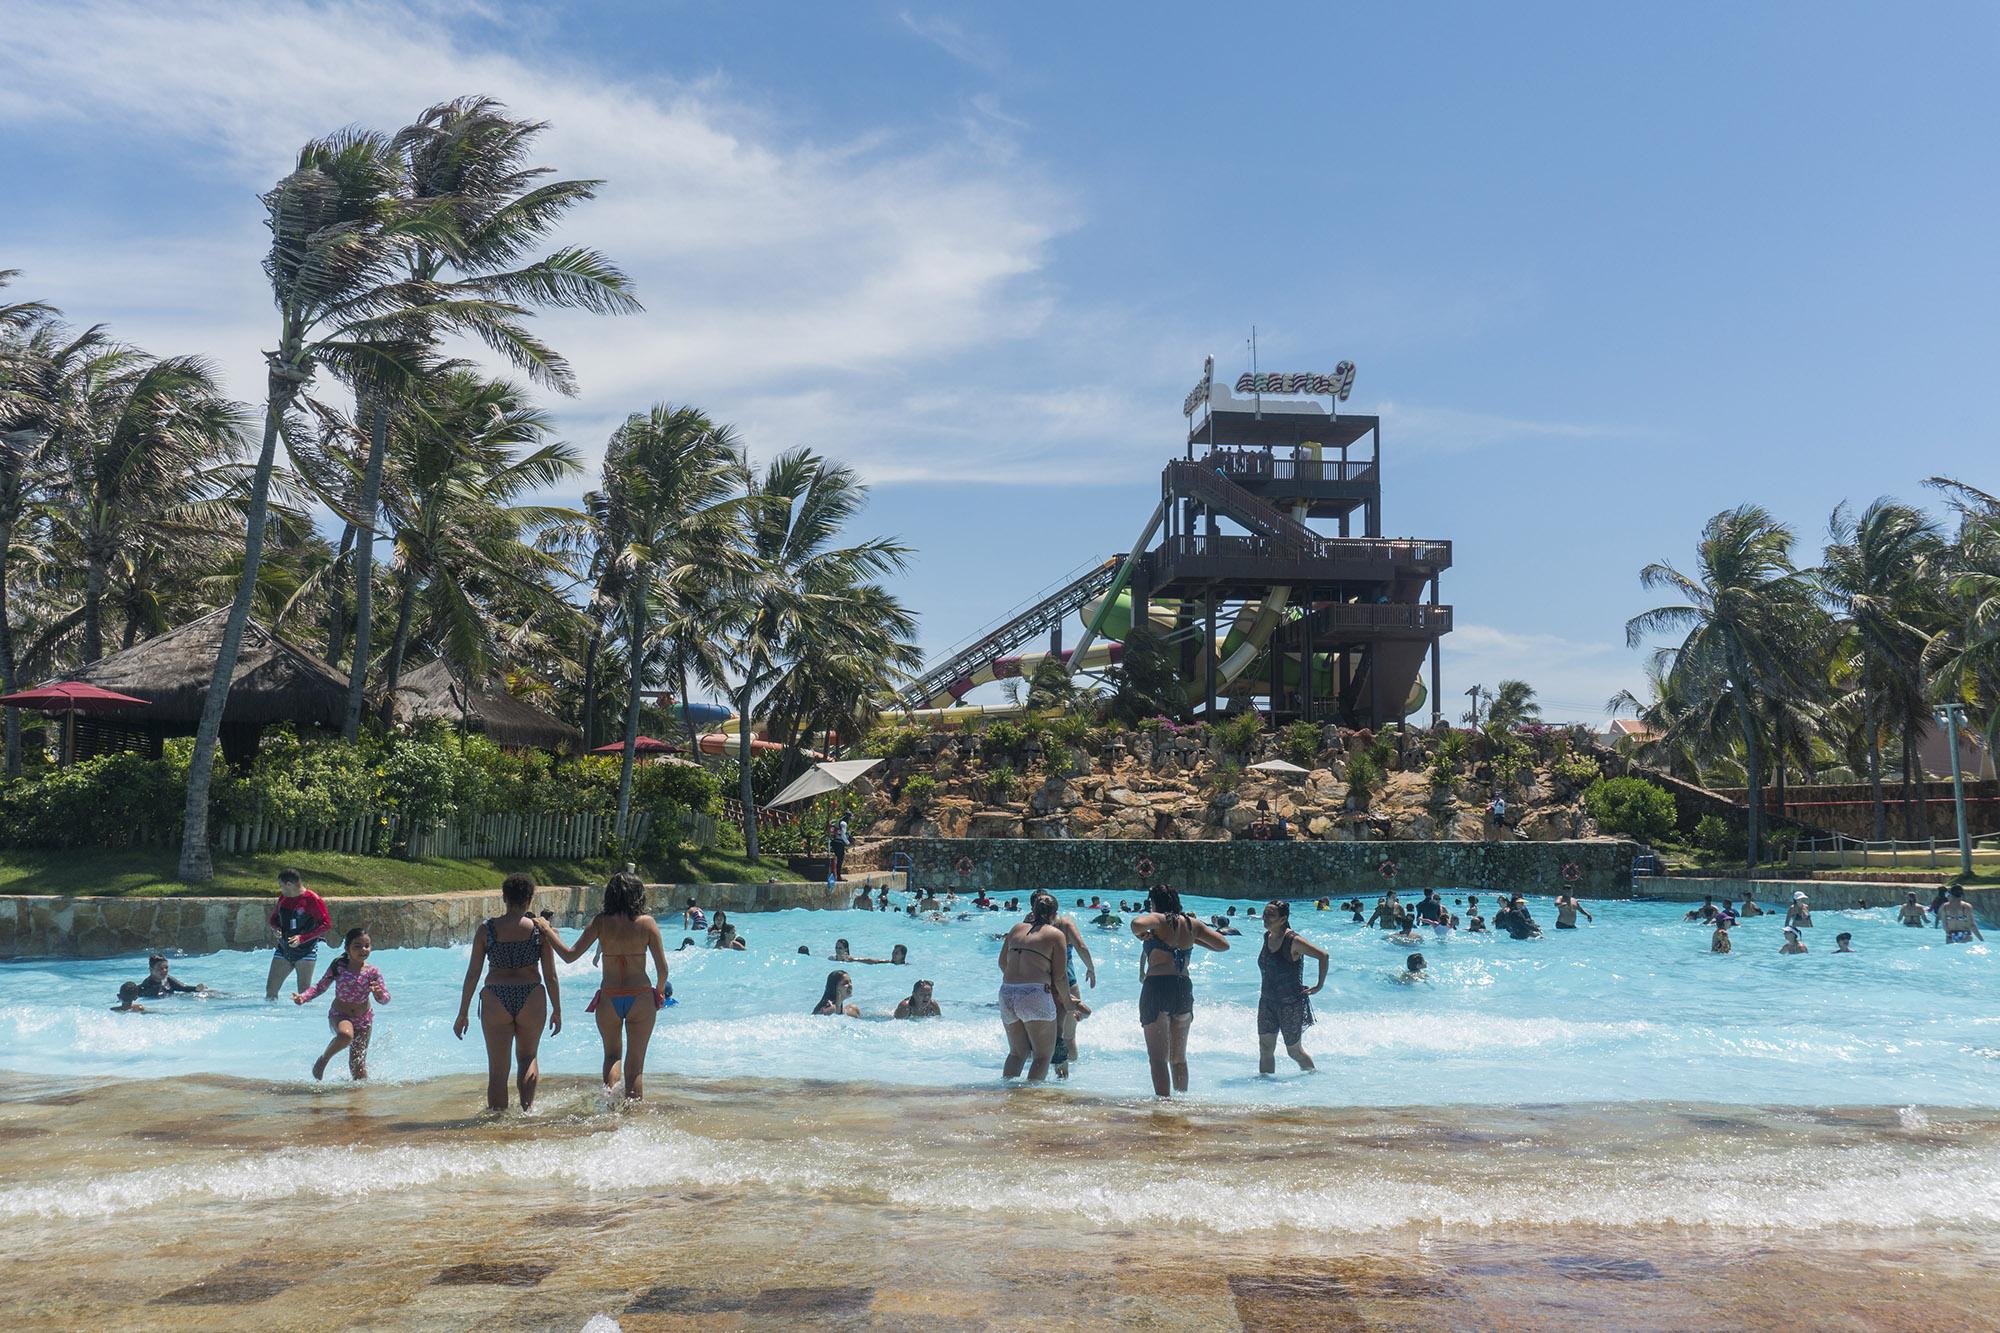 Maremoto - Beach Park